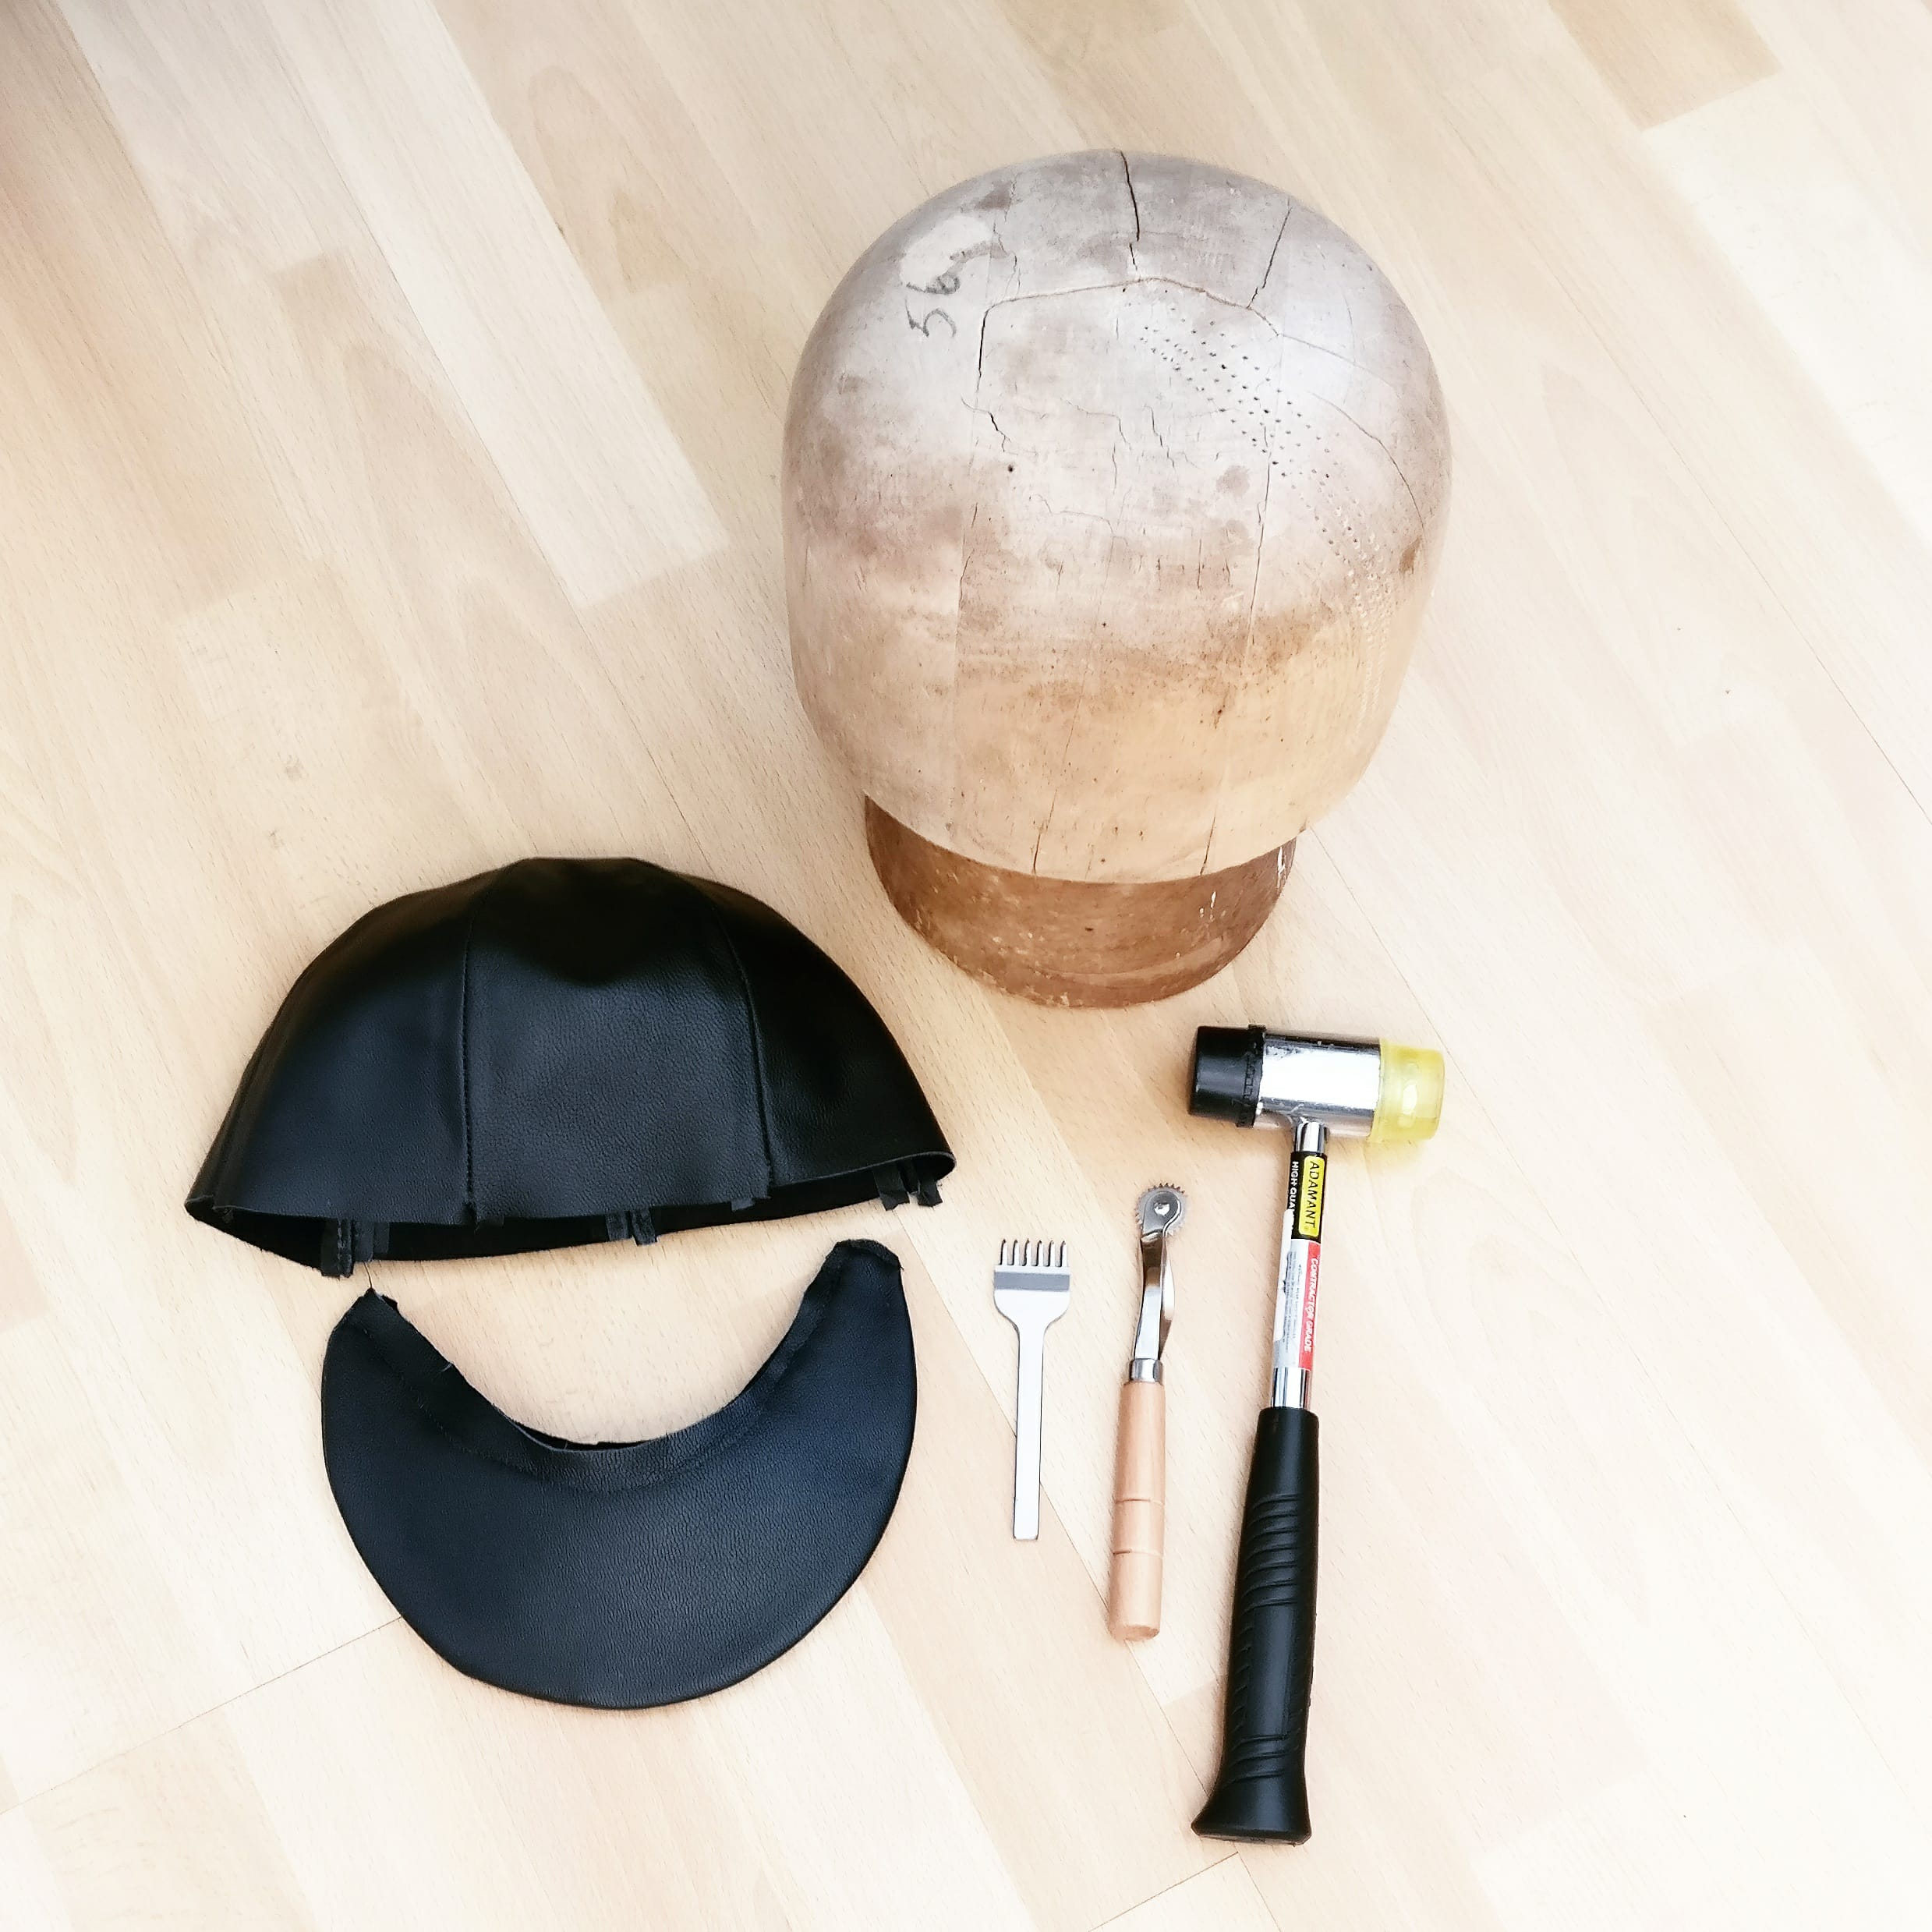 Björnram Millinery hattar hårdekoration accessoarer modist Louise Björnram